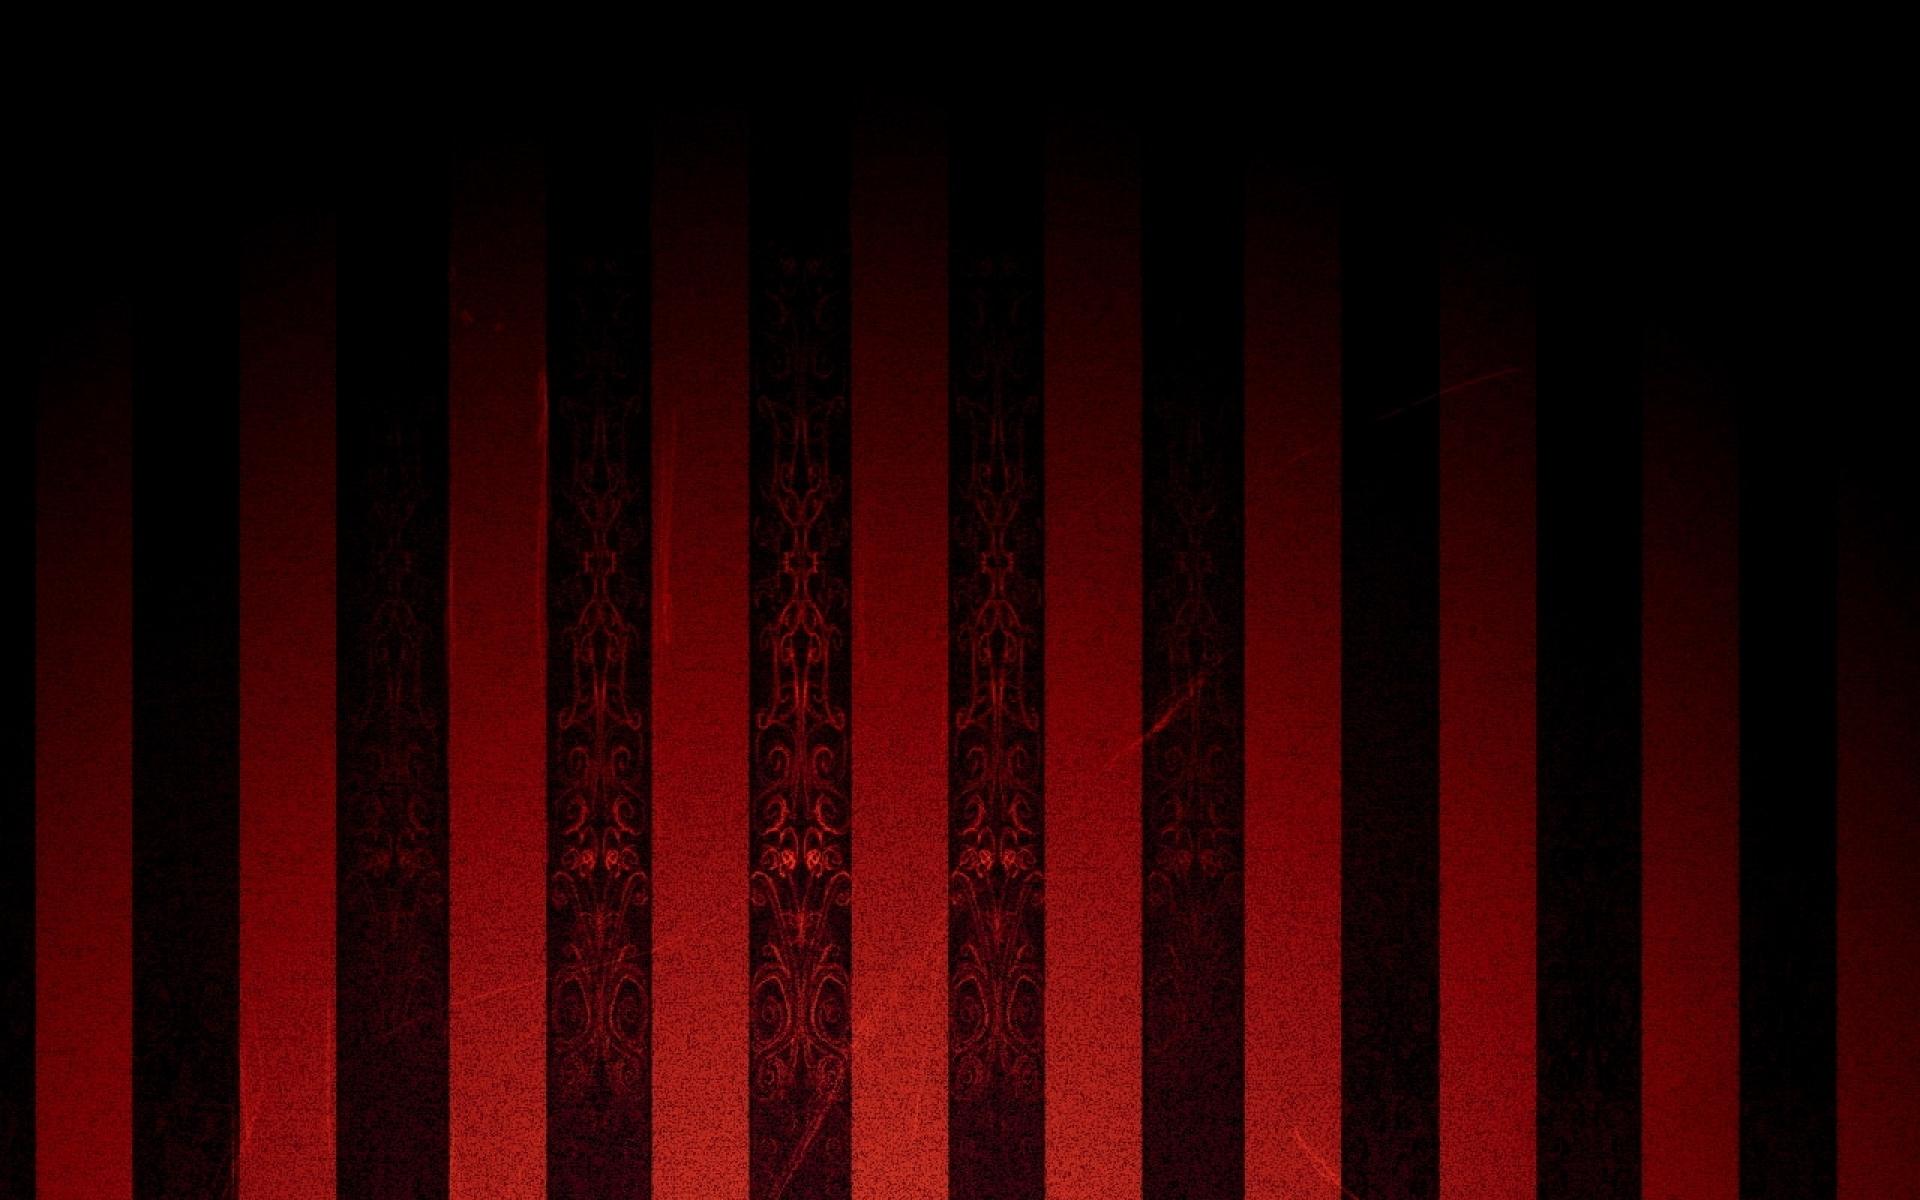 Black Red hd wallpaper for desktop HD Wallpaper 1920x1200